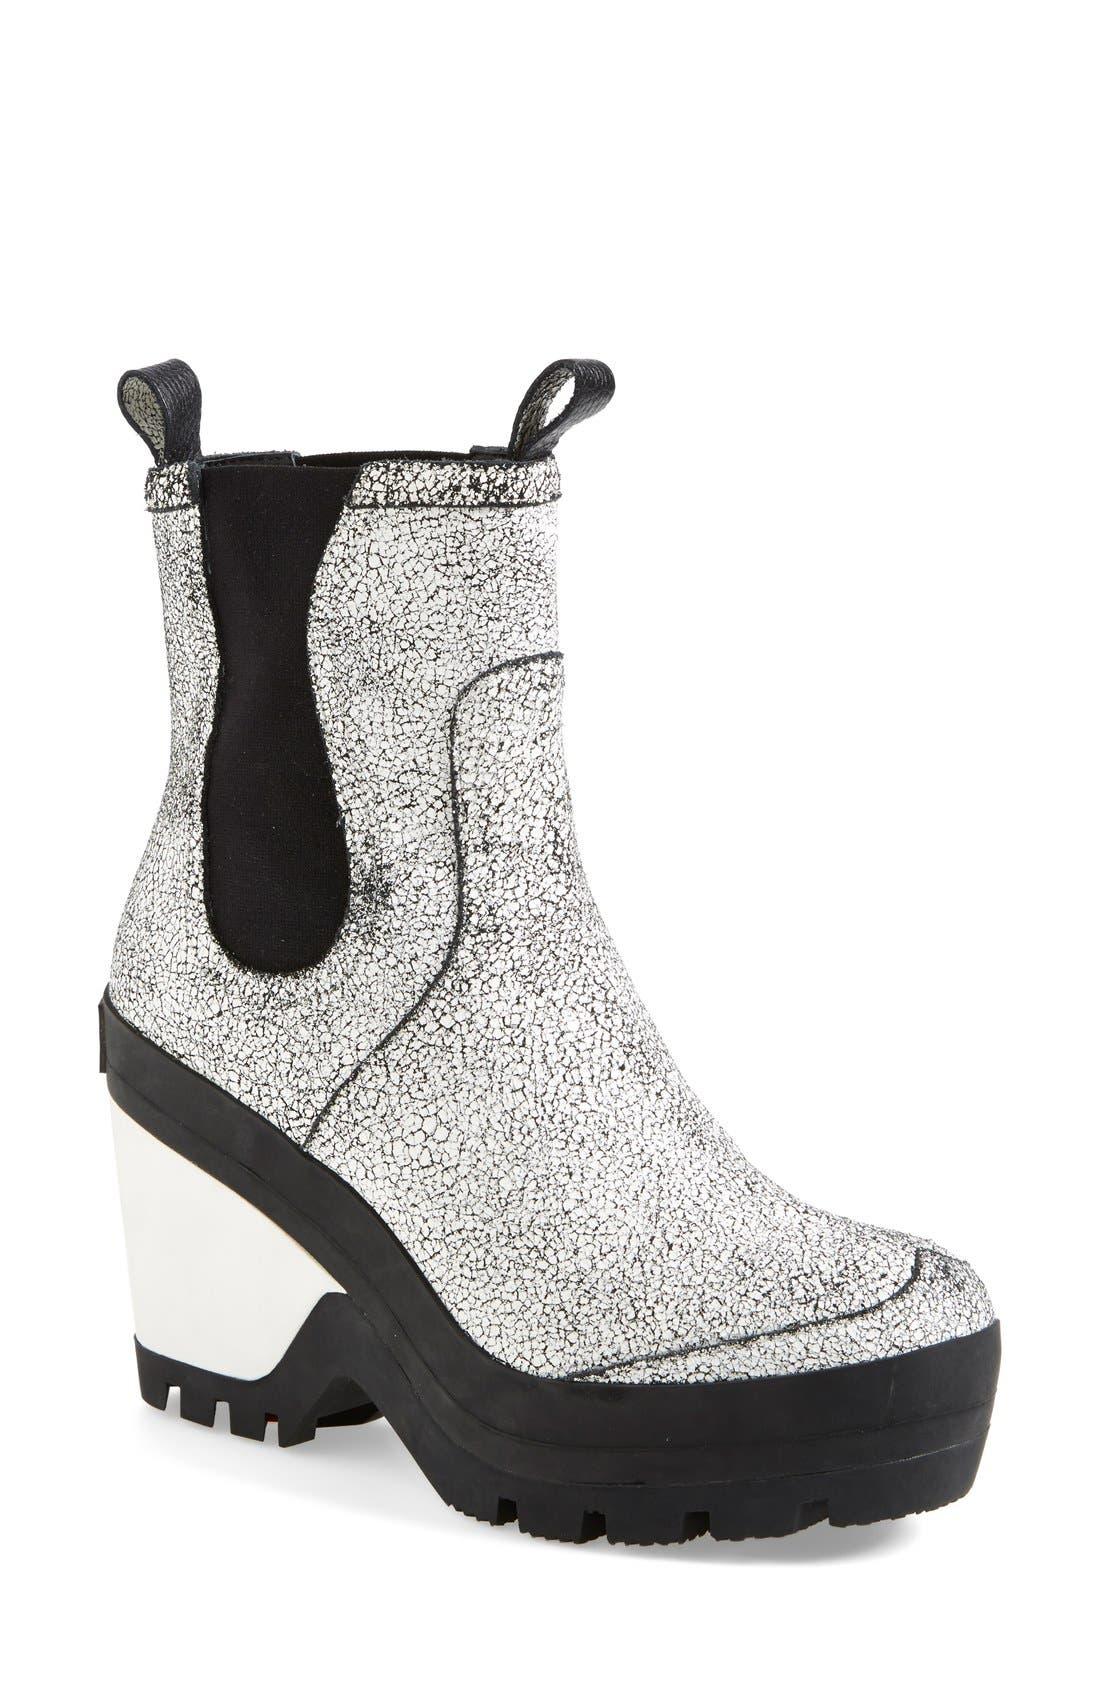 Alternate Image 1 Selected - Hunter Crackled Leather Chelsea Rain Boot (Women)